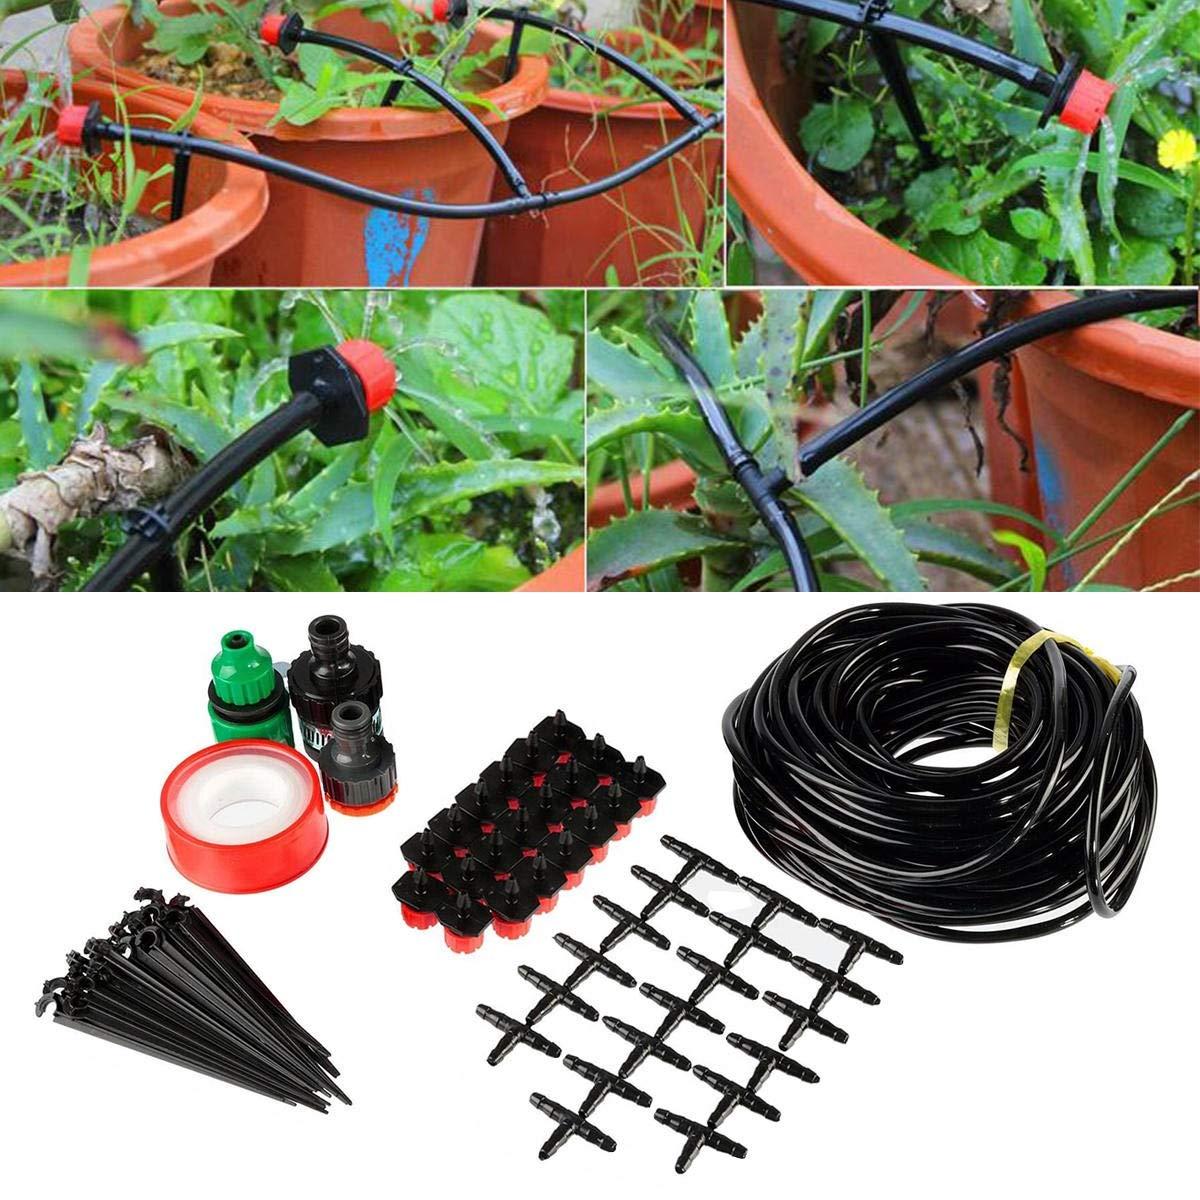 Subobo Kits de riego por Goteo, Jardín Kit Sistema de riego por aspersión riego automático 15M